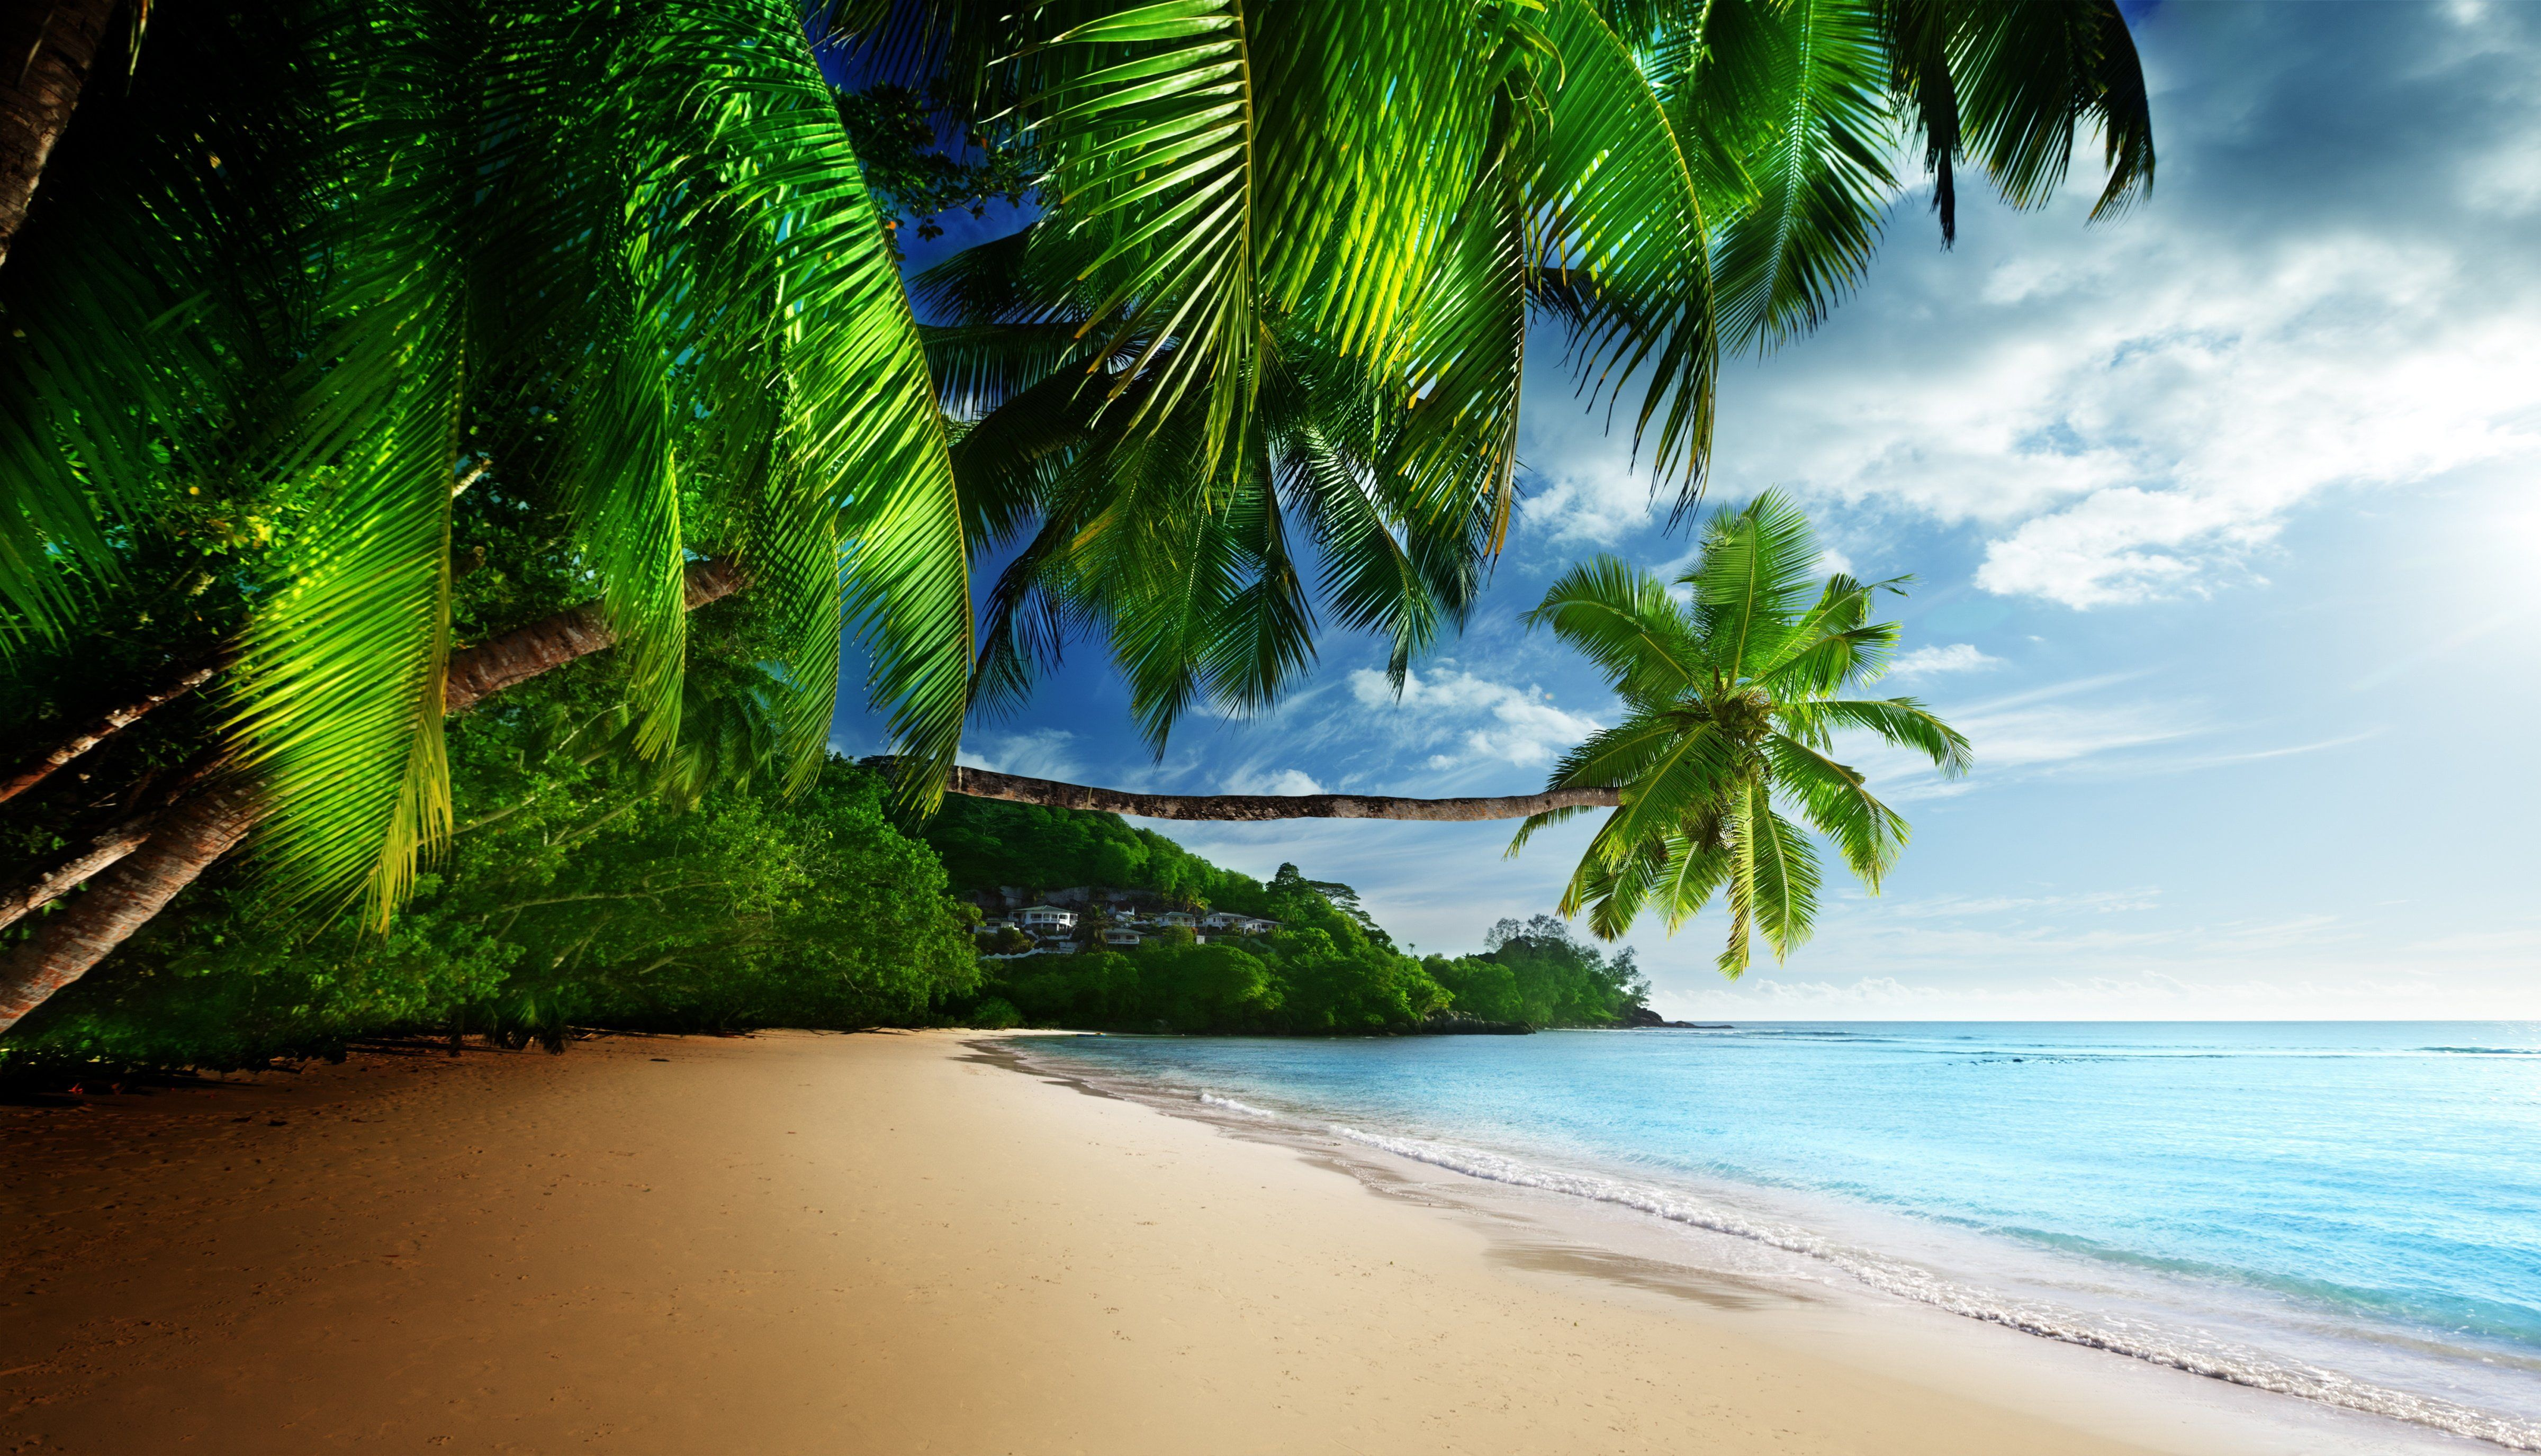 Beach Blue Coast Emerald Paradise Sea Sky Sunshine Tropical 4k Wallpaper Hdwallpaper Beach Wallpaper Beach Pictures Wallpaper Tropical Background Desktop wallpaper beach paradise